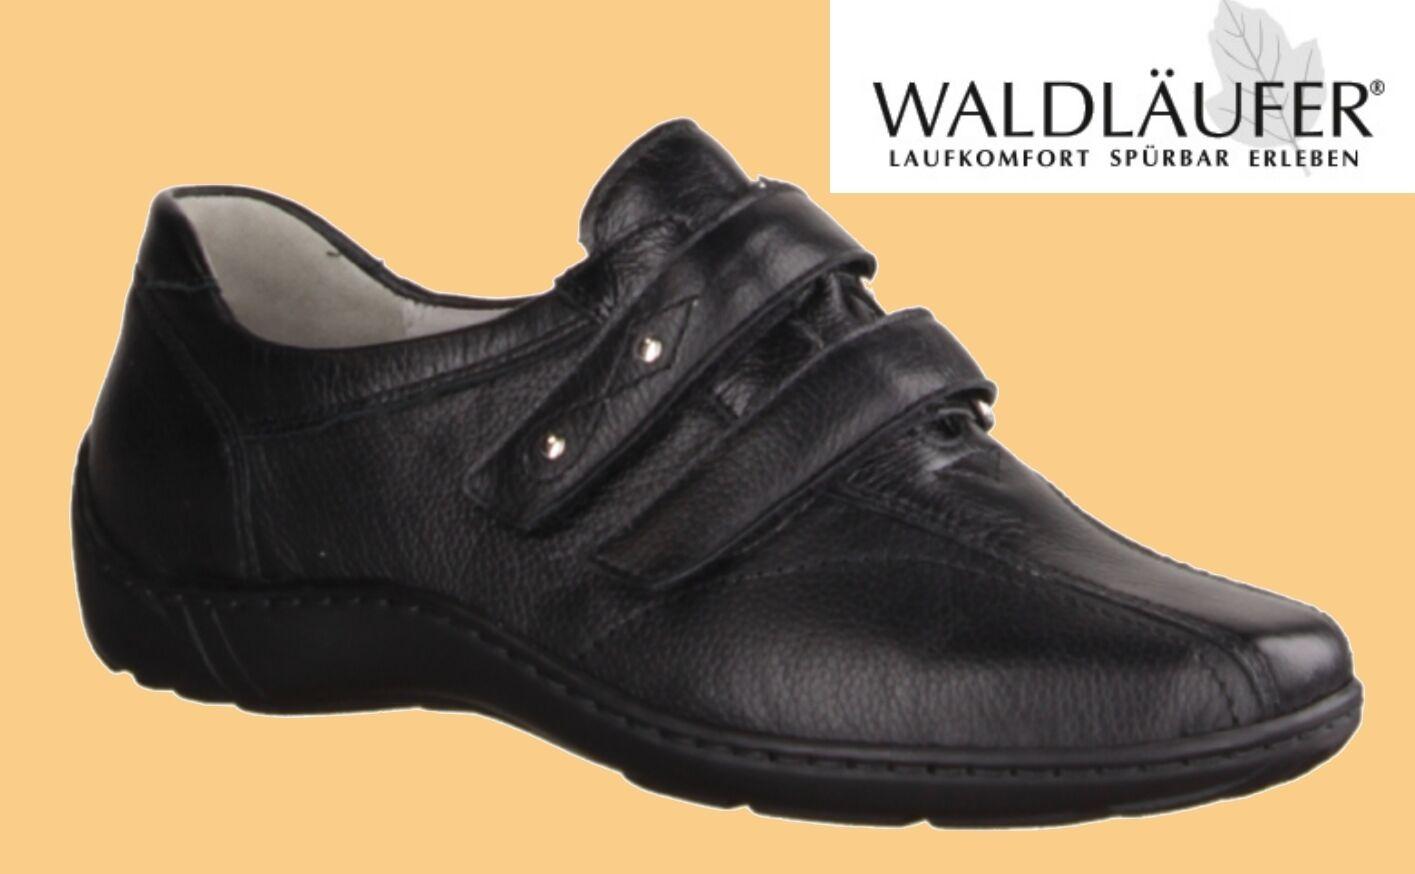 Waldläufer Damen Halbschuhe Slipper Klettschuhe schwarz PRO AKTIV Komfort Schuhe schwarz Klettschuhe 4e4a8e